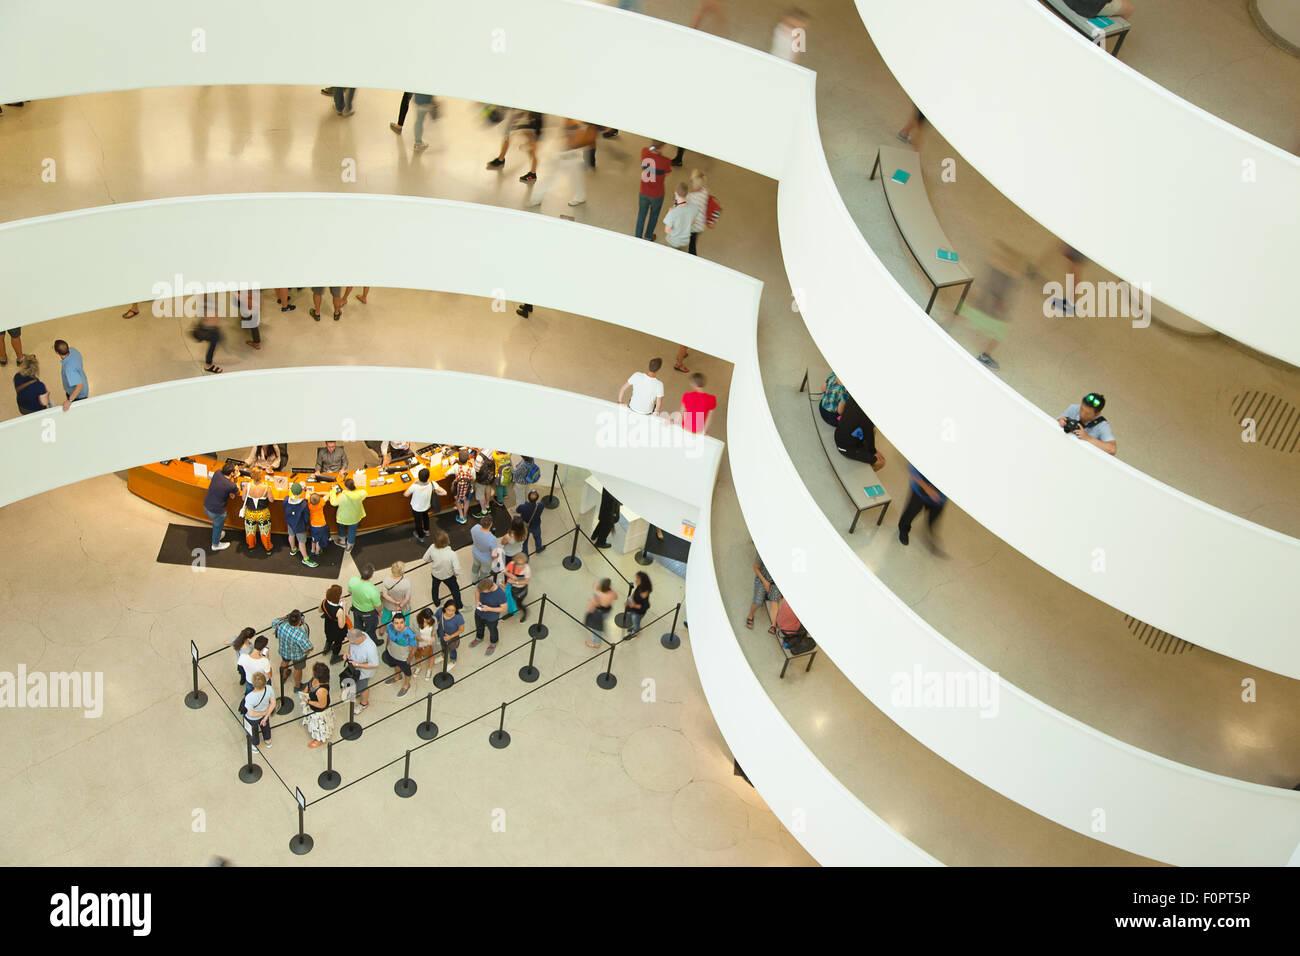 USA, New York State, New York City, Manhattan, Interior of the Solomon R Guggenheim Museum on 5th Avenue. - Stock Image